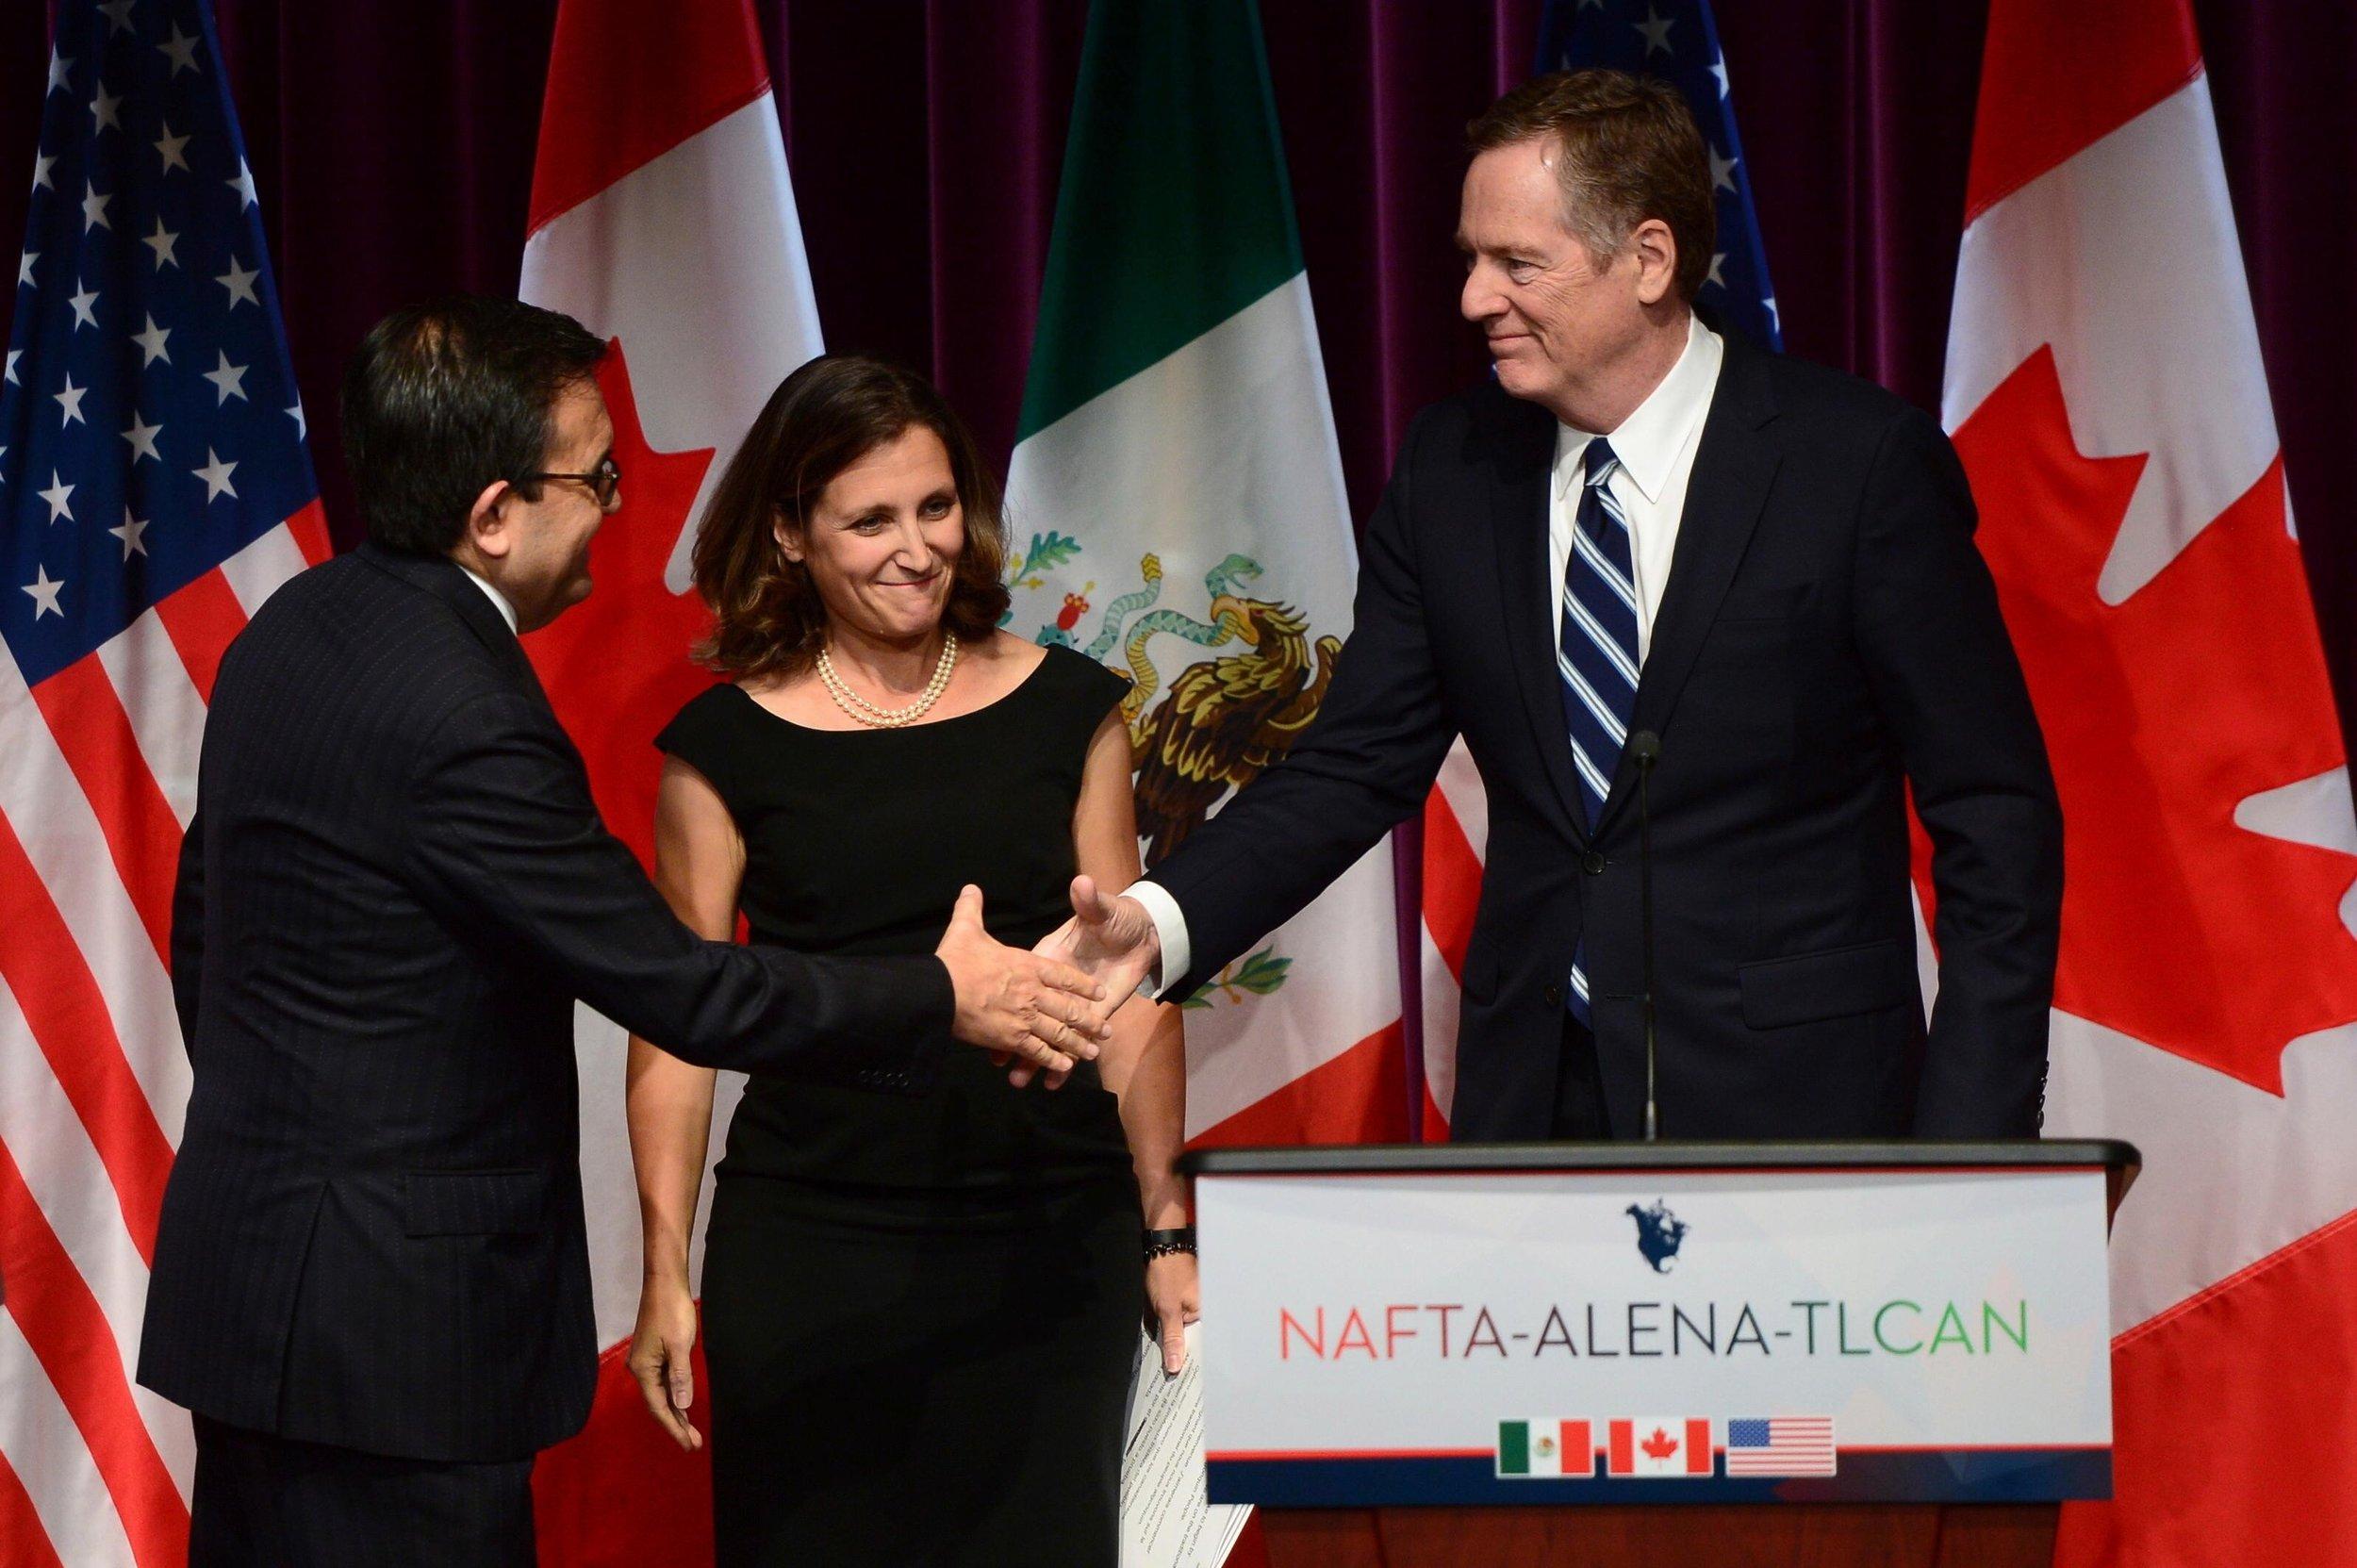 Mexico's Secretary of Economy, Ildefonso Guajardo Villarreal, left, shakes hands with U.S. Trade Representative Robert Lighthizer. || Sean Kilpatrick, AP.